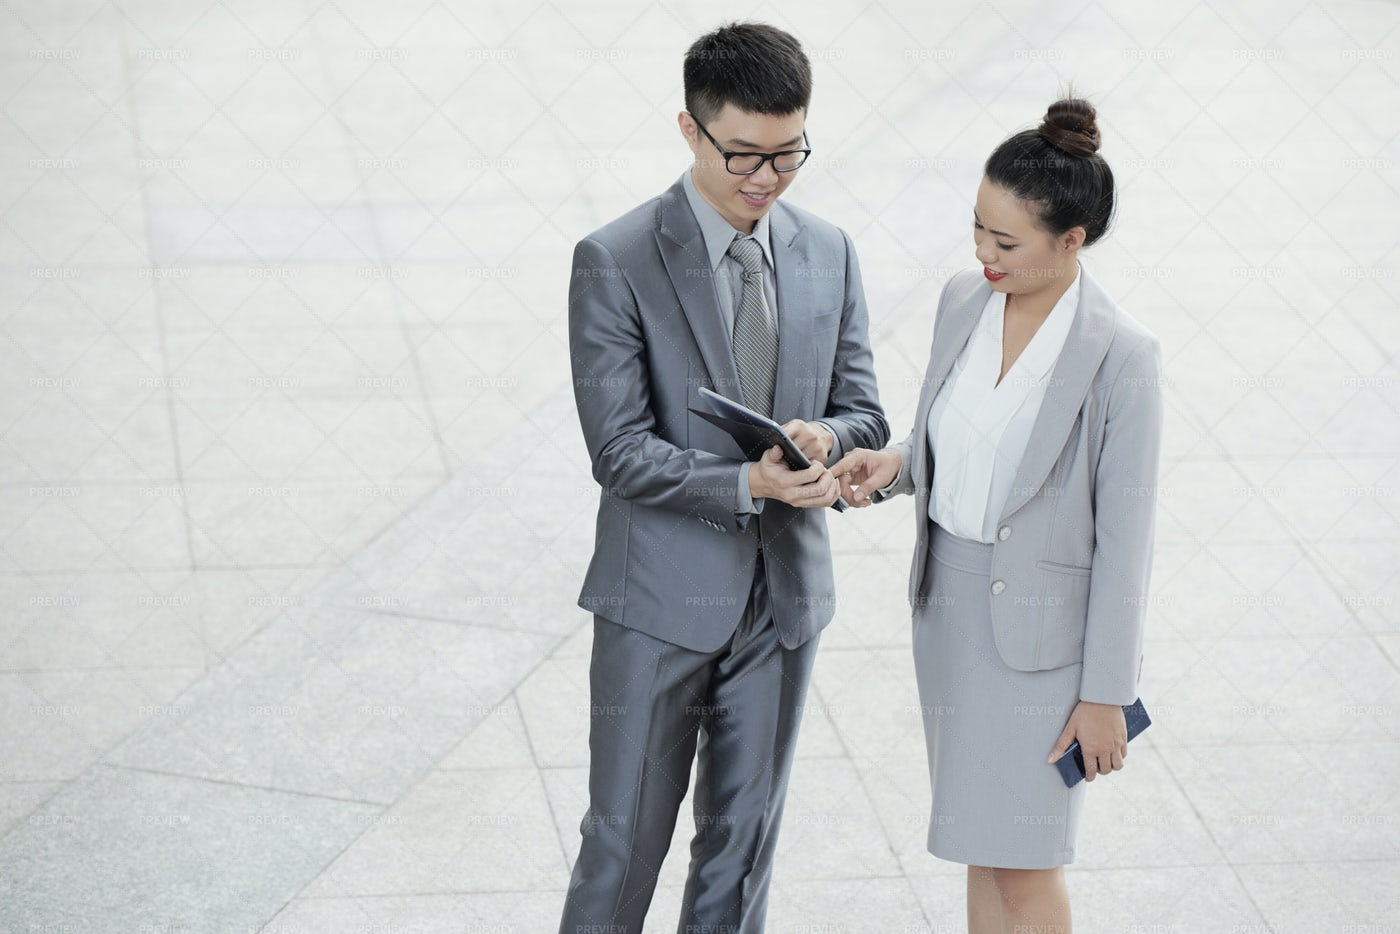 Entrepreneurs Checking Data On Tablet: Stock Photos